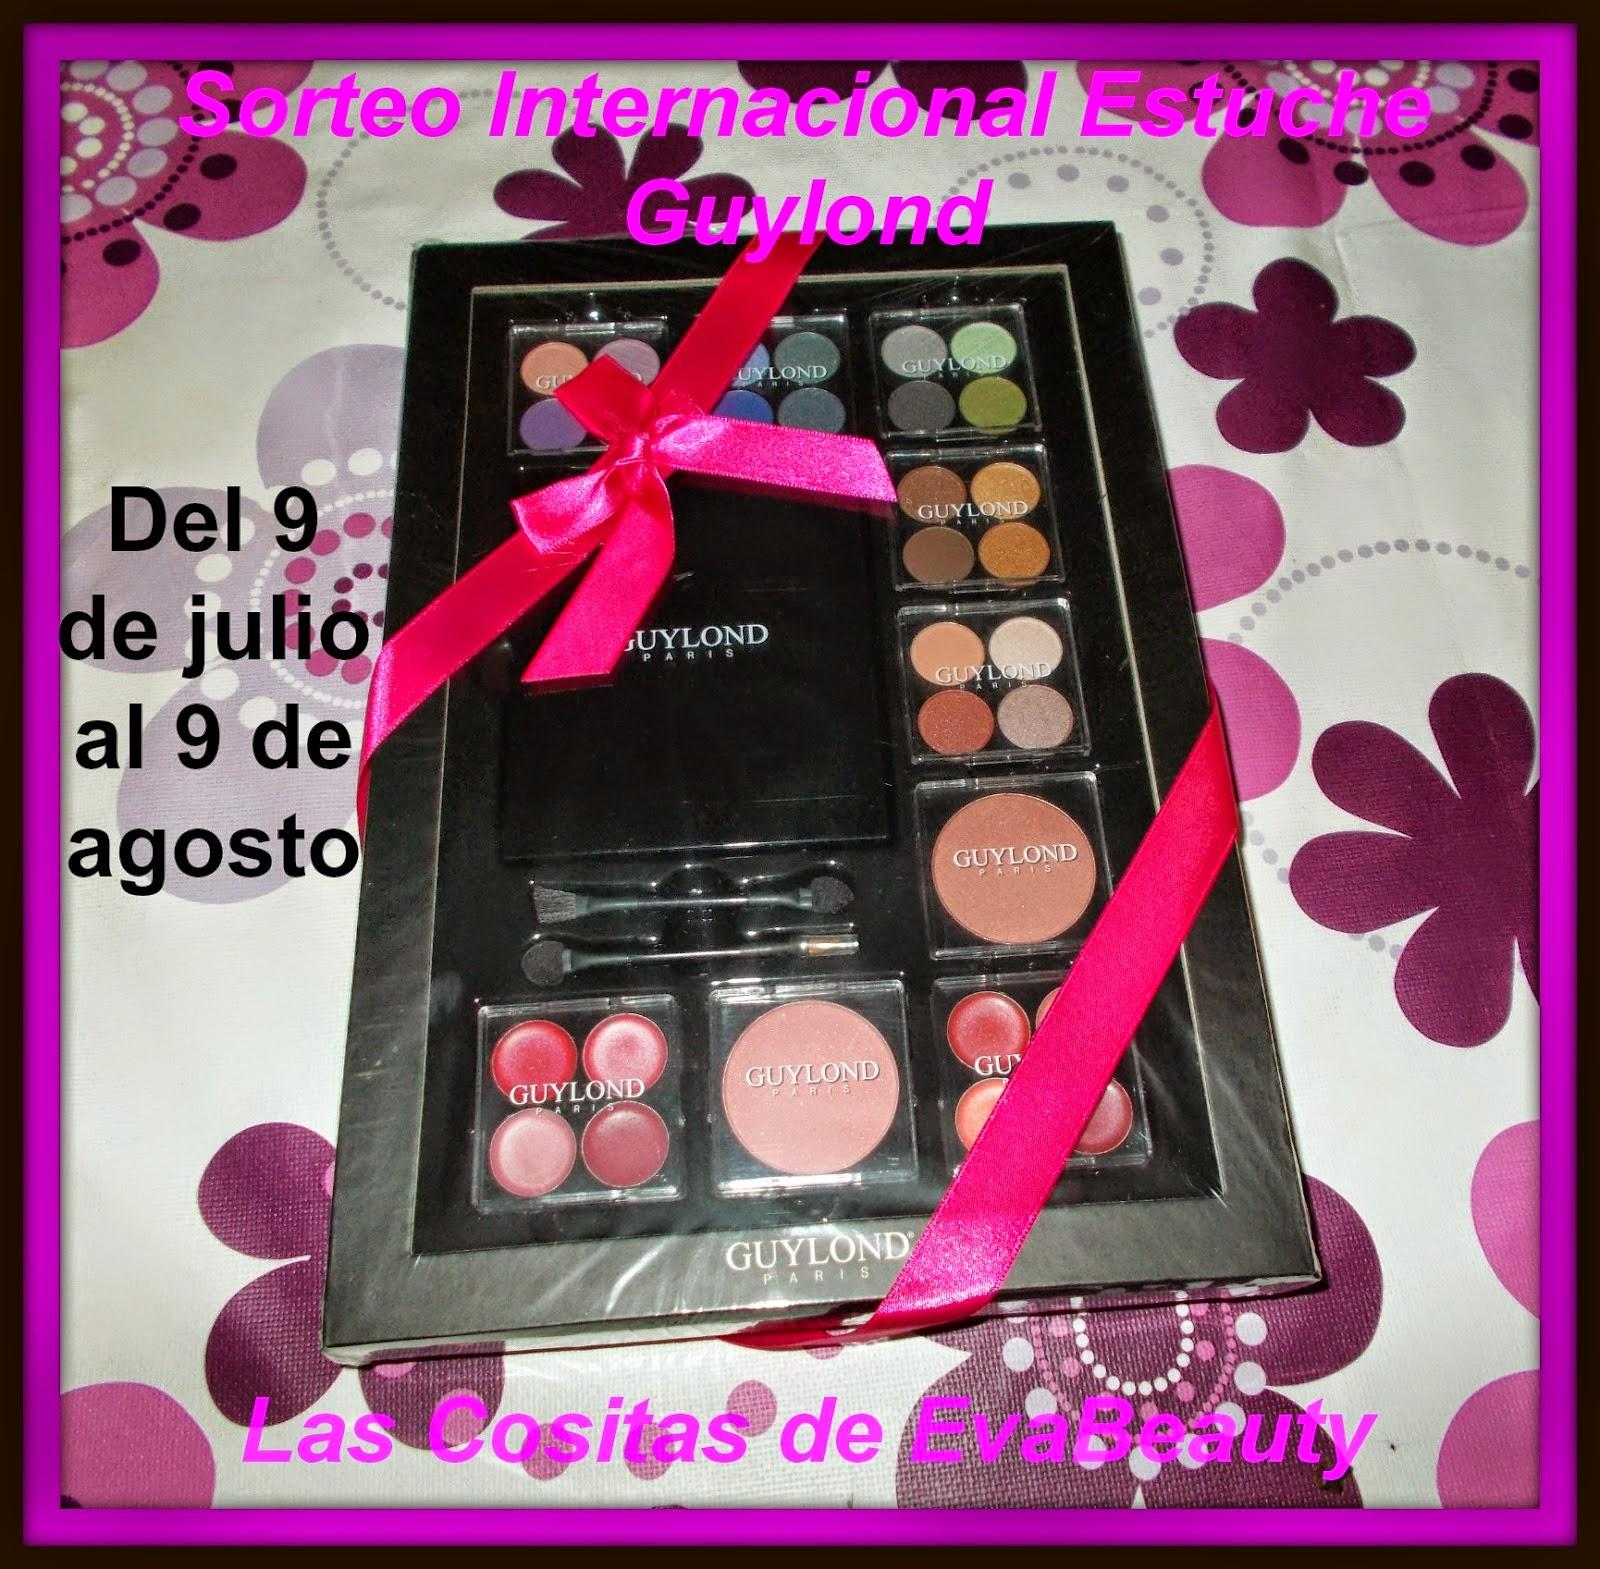 http://lascositasdeevabeauty.blogspot.com.es/2014/07/sorteo-internacional-estuche-guylond.html